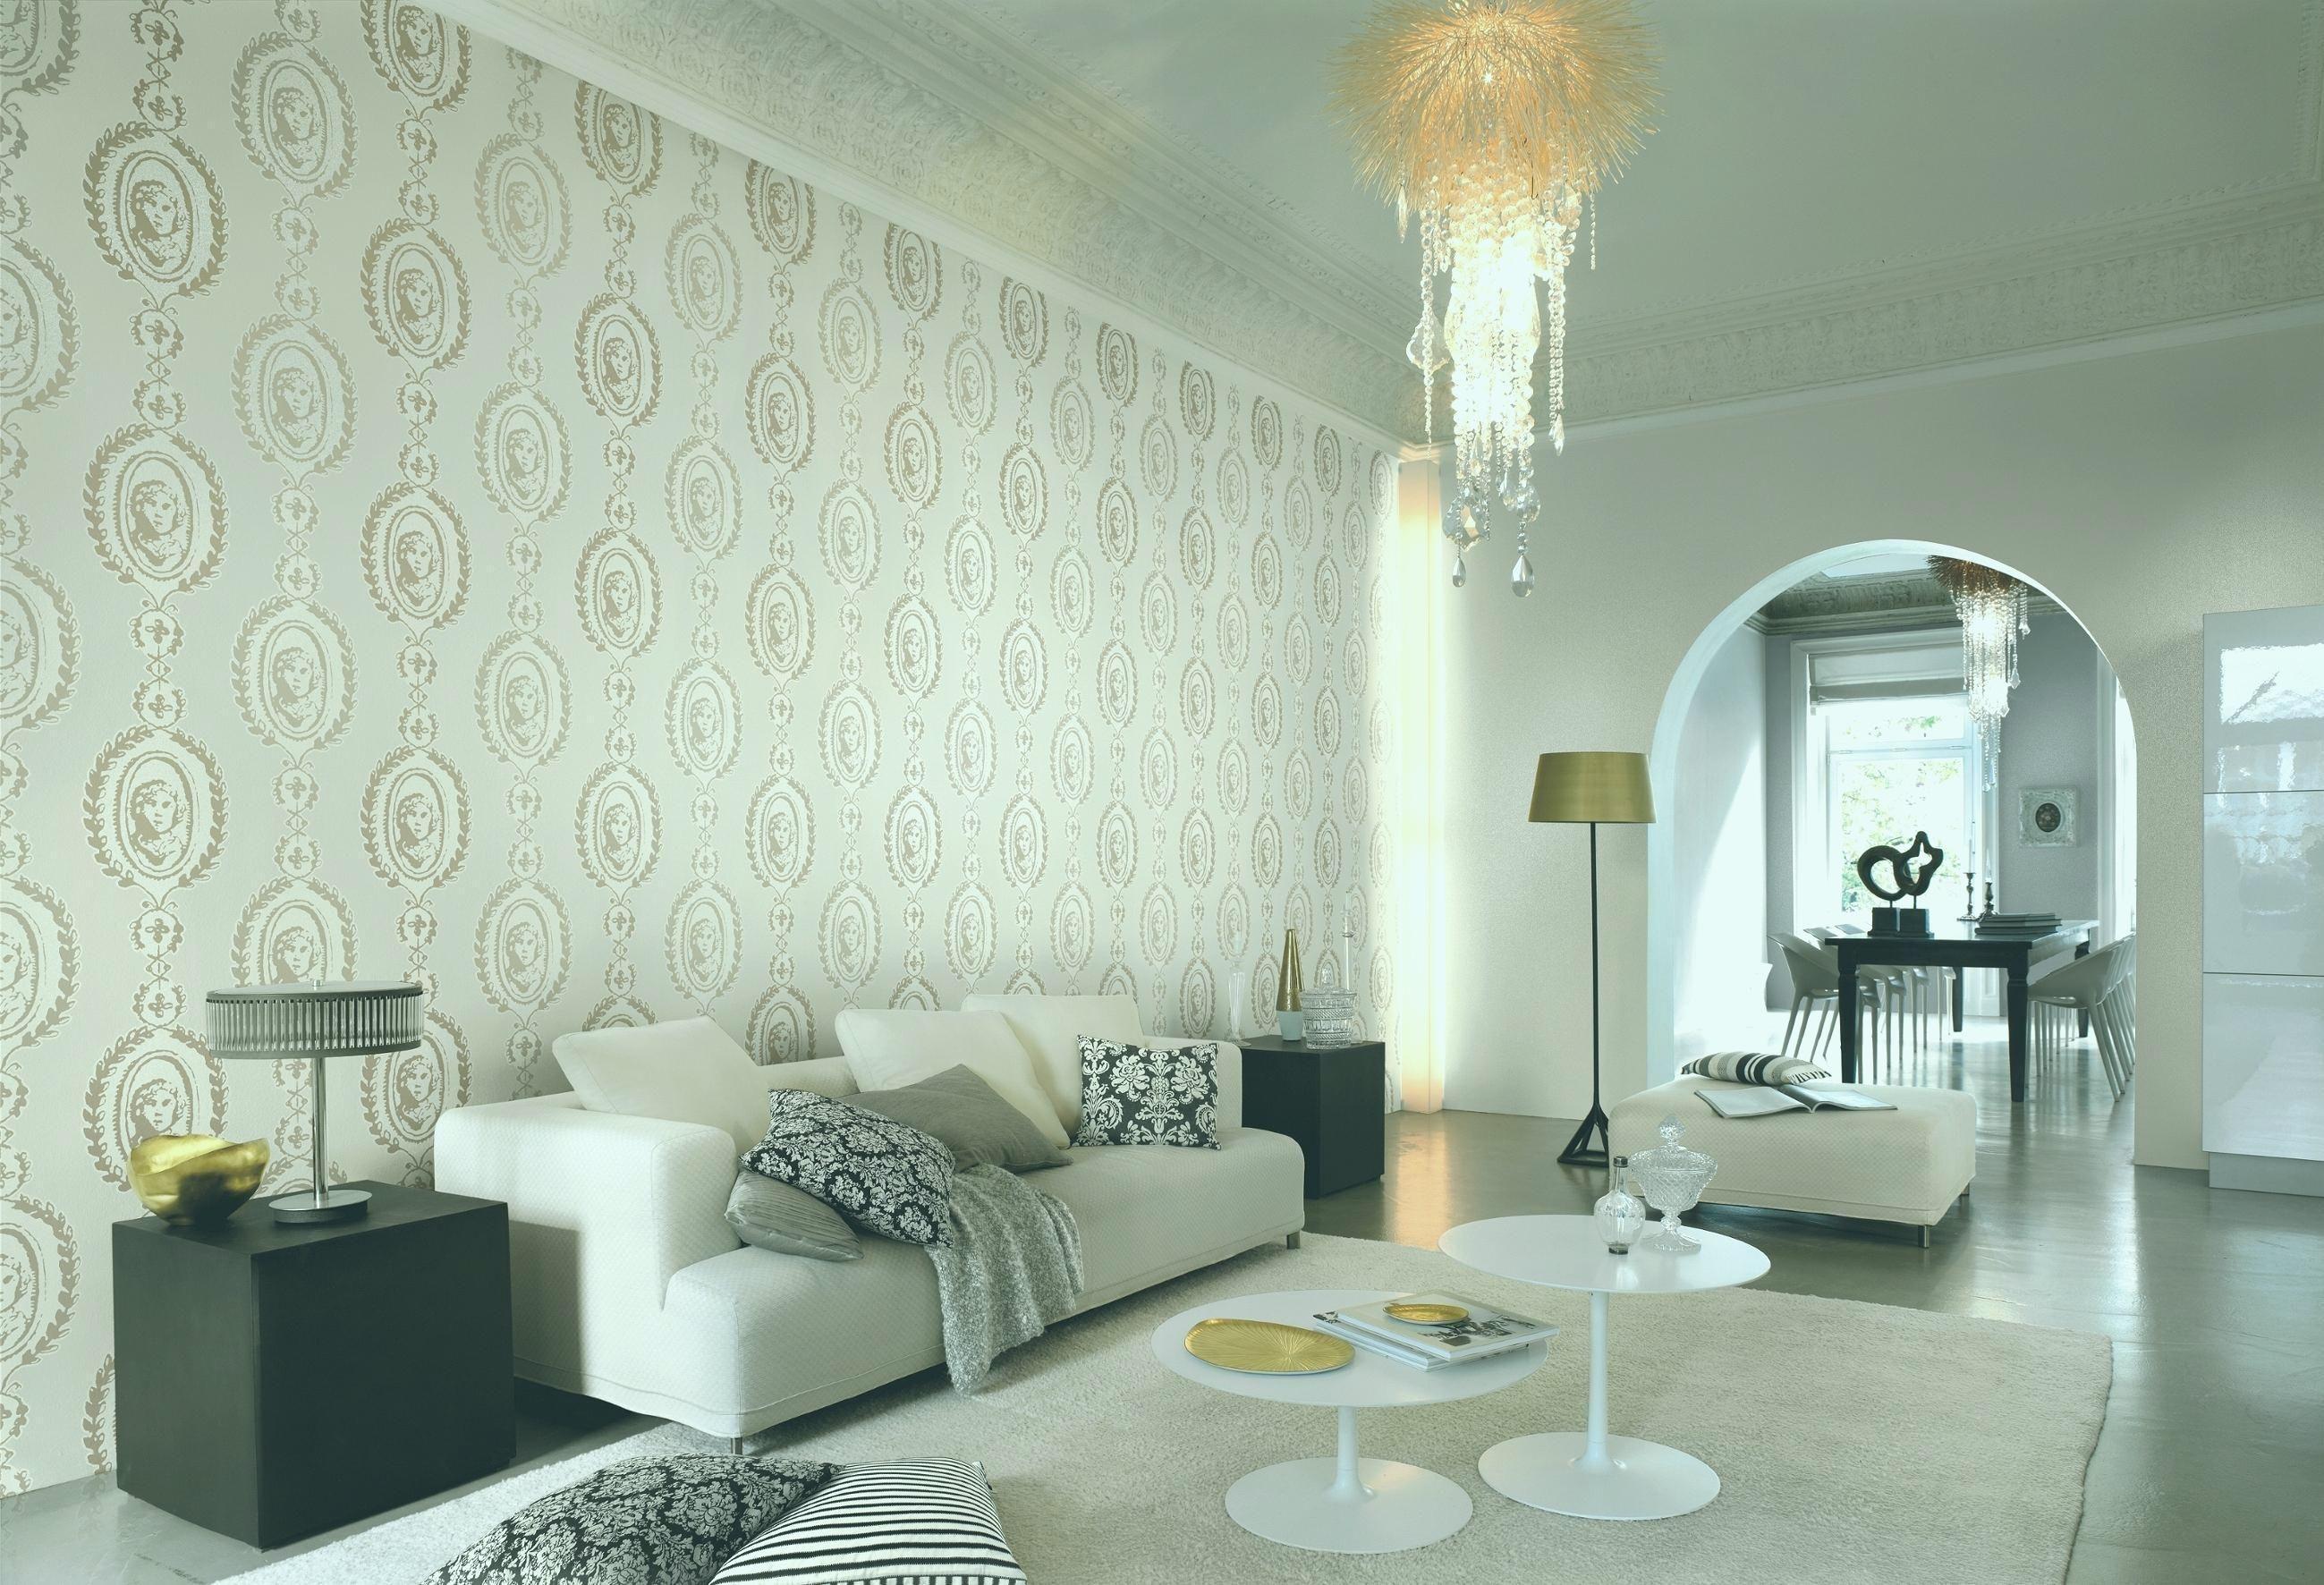 Nett Tapete Schlafzimmer Romantisch | Home decor, Room set ...